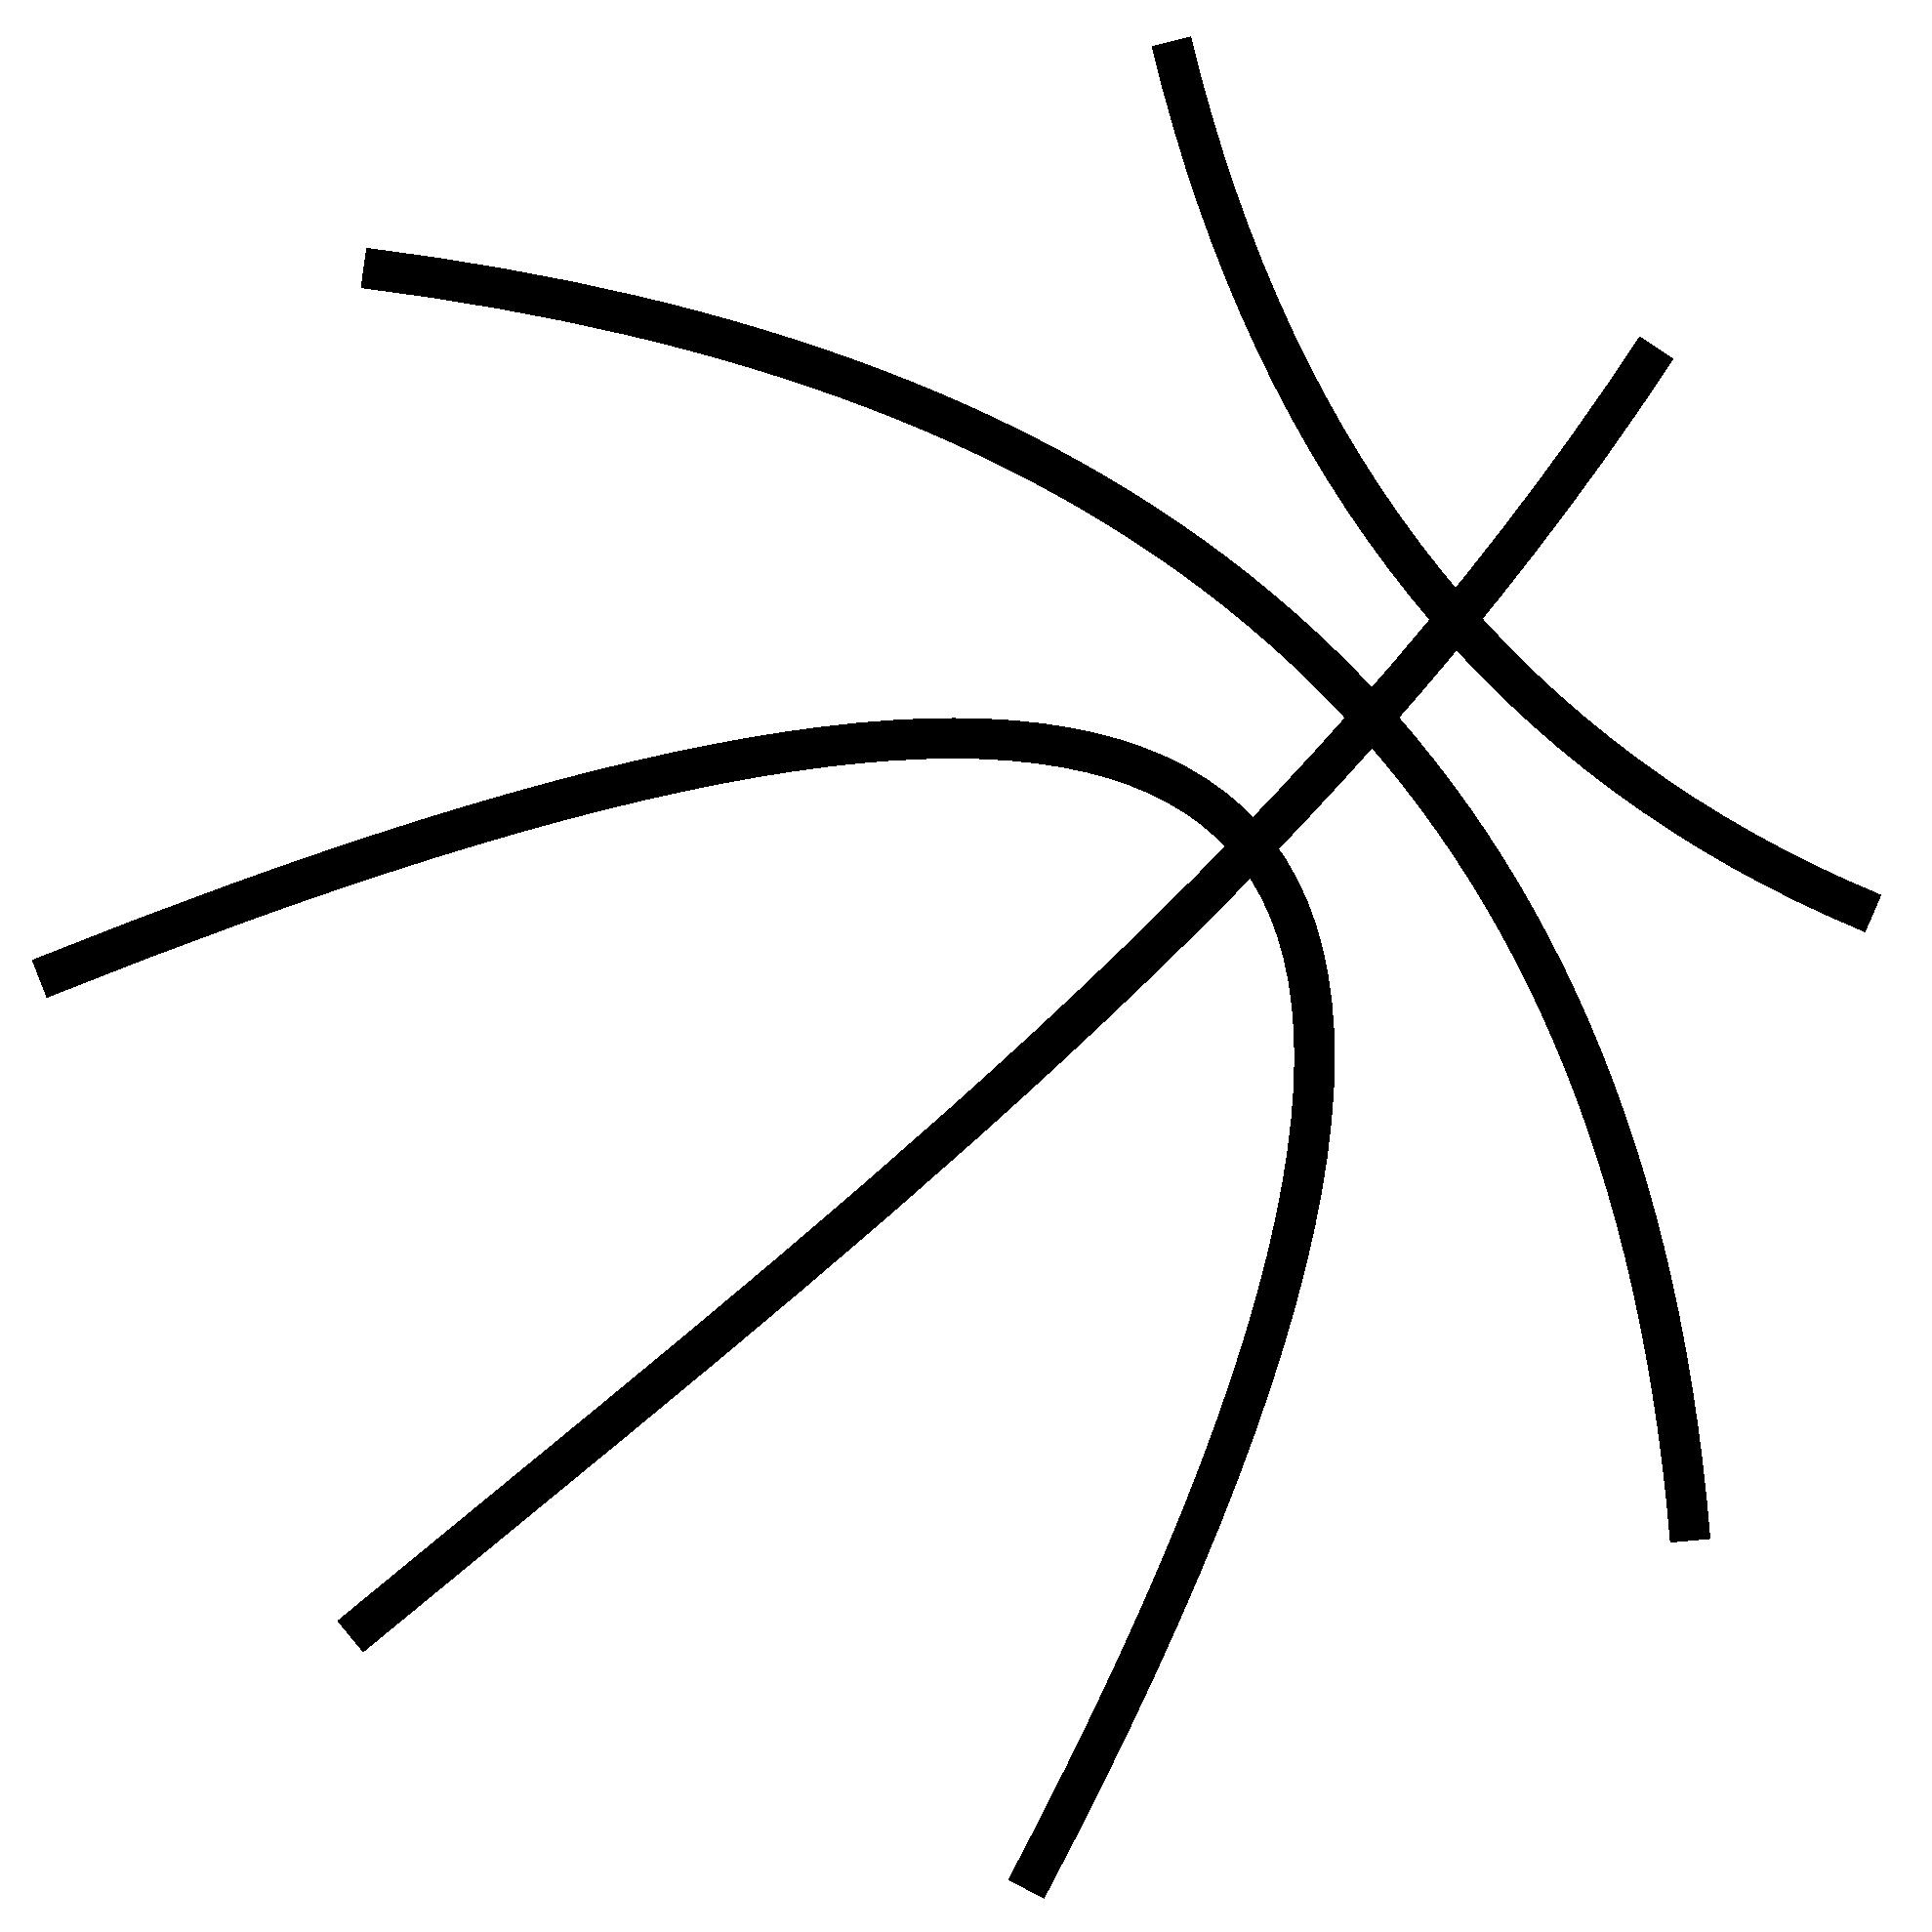 Eggplant outline